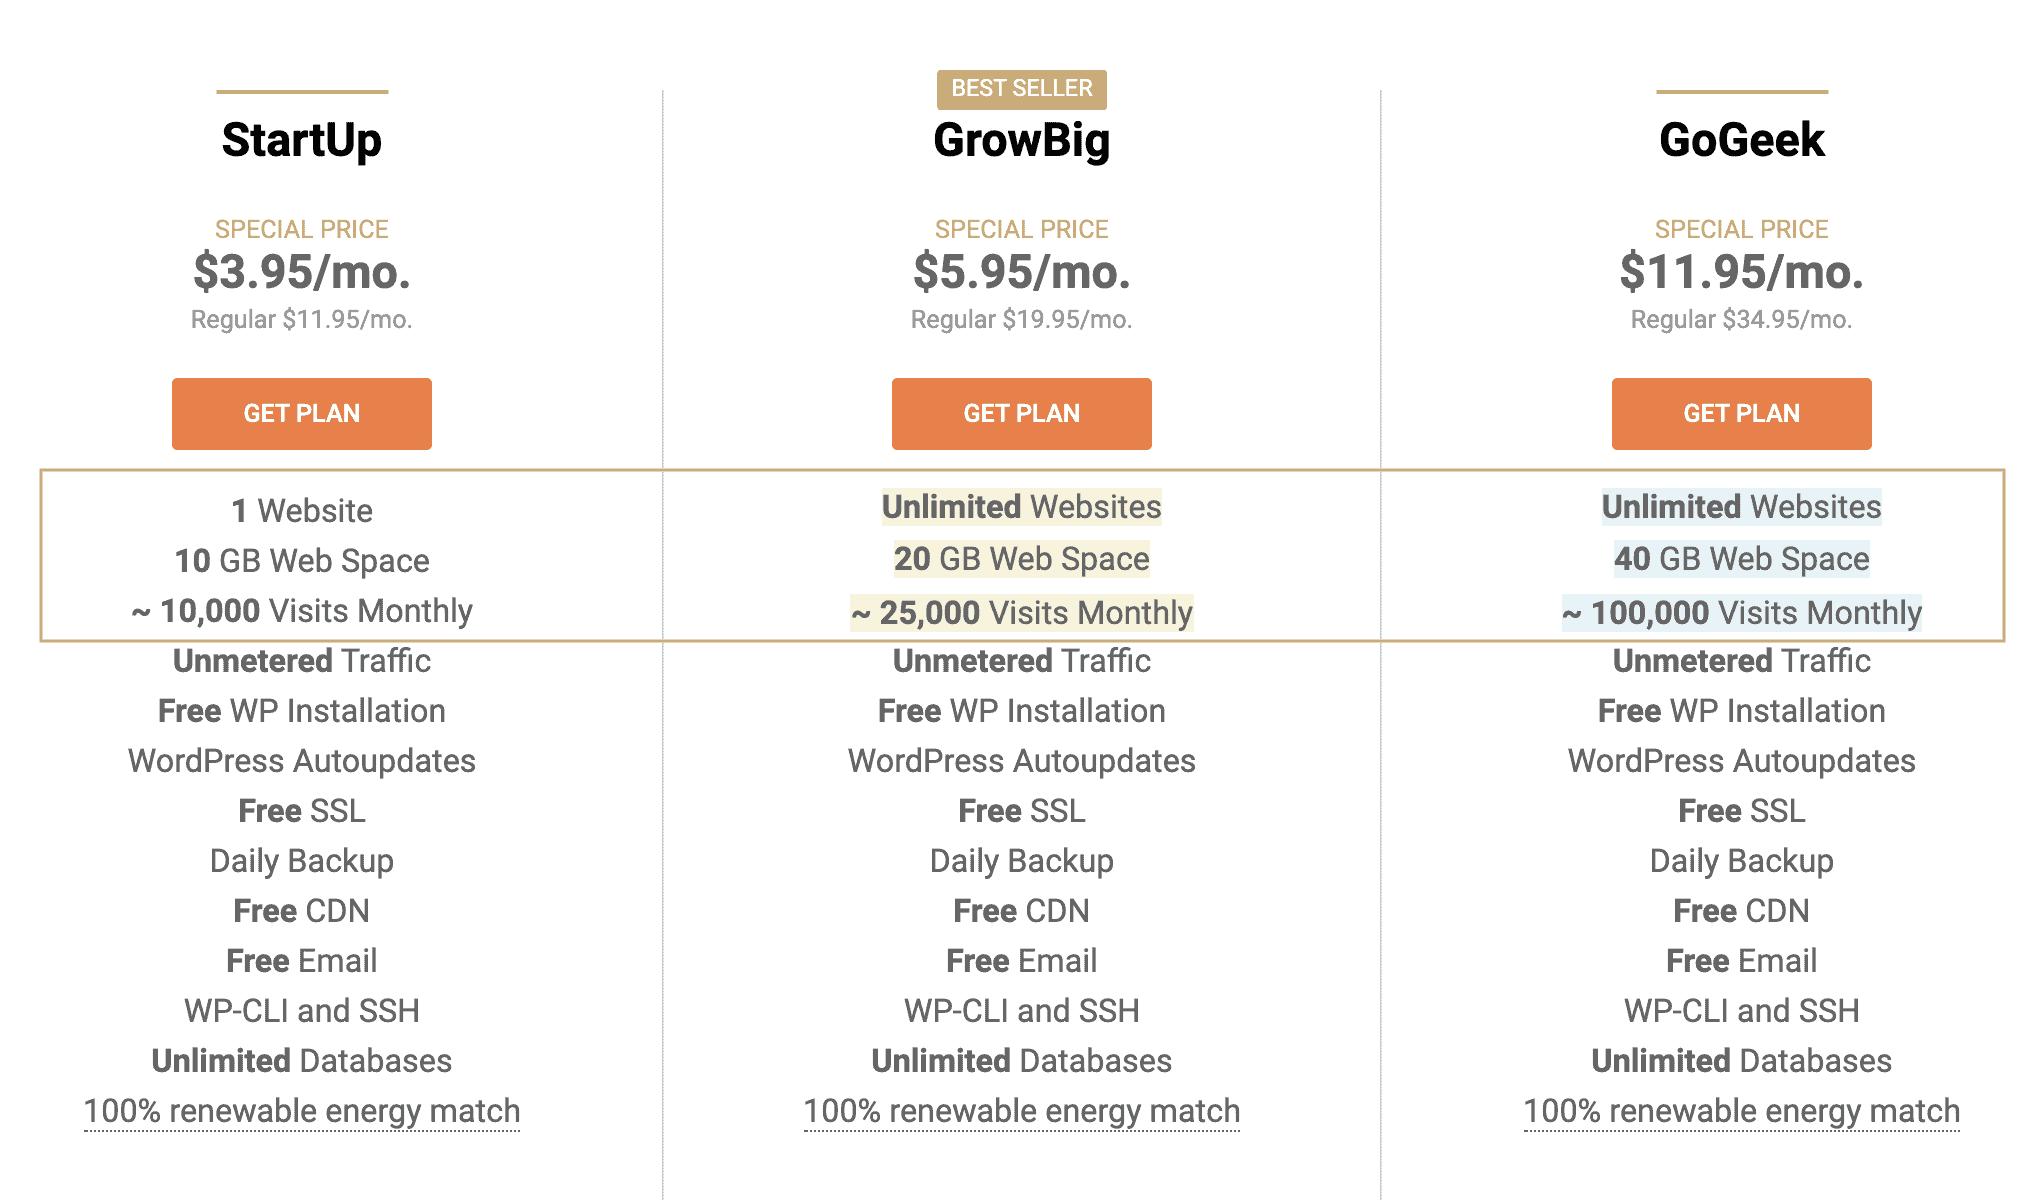 SiteGround StartUp vs GrowBig vs GoGeek